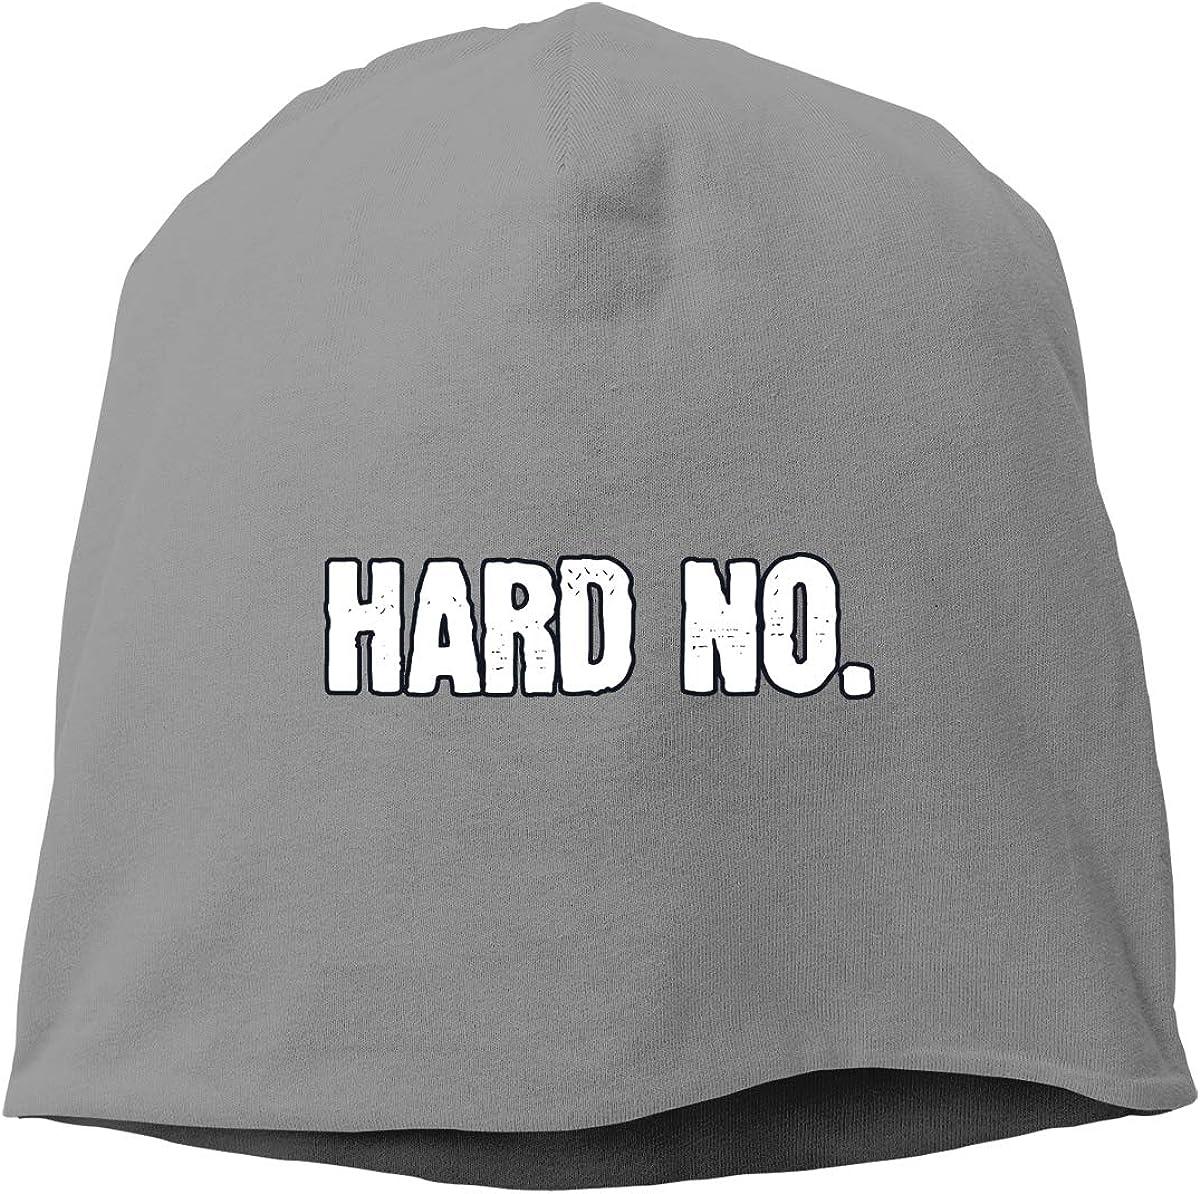 Letterkenny Hard No Skull Cap Helmet Liner Beanie Cap for Men Hip Hop Hedging Head Hat